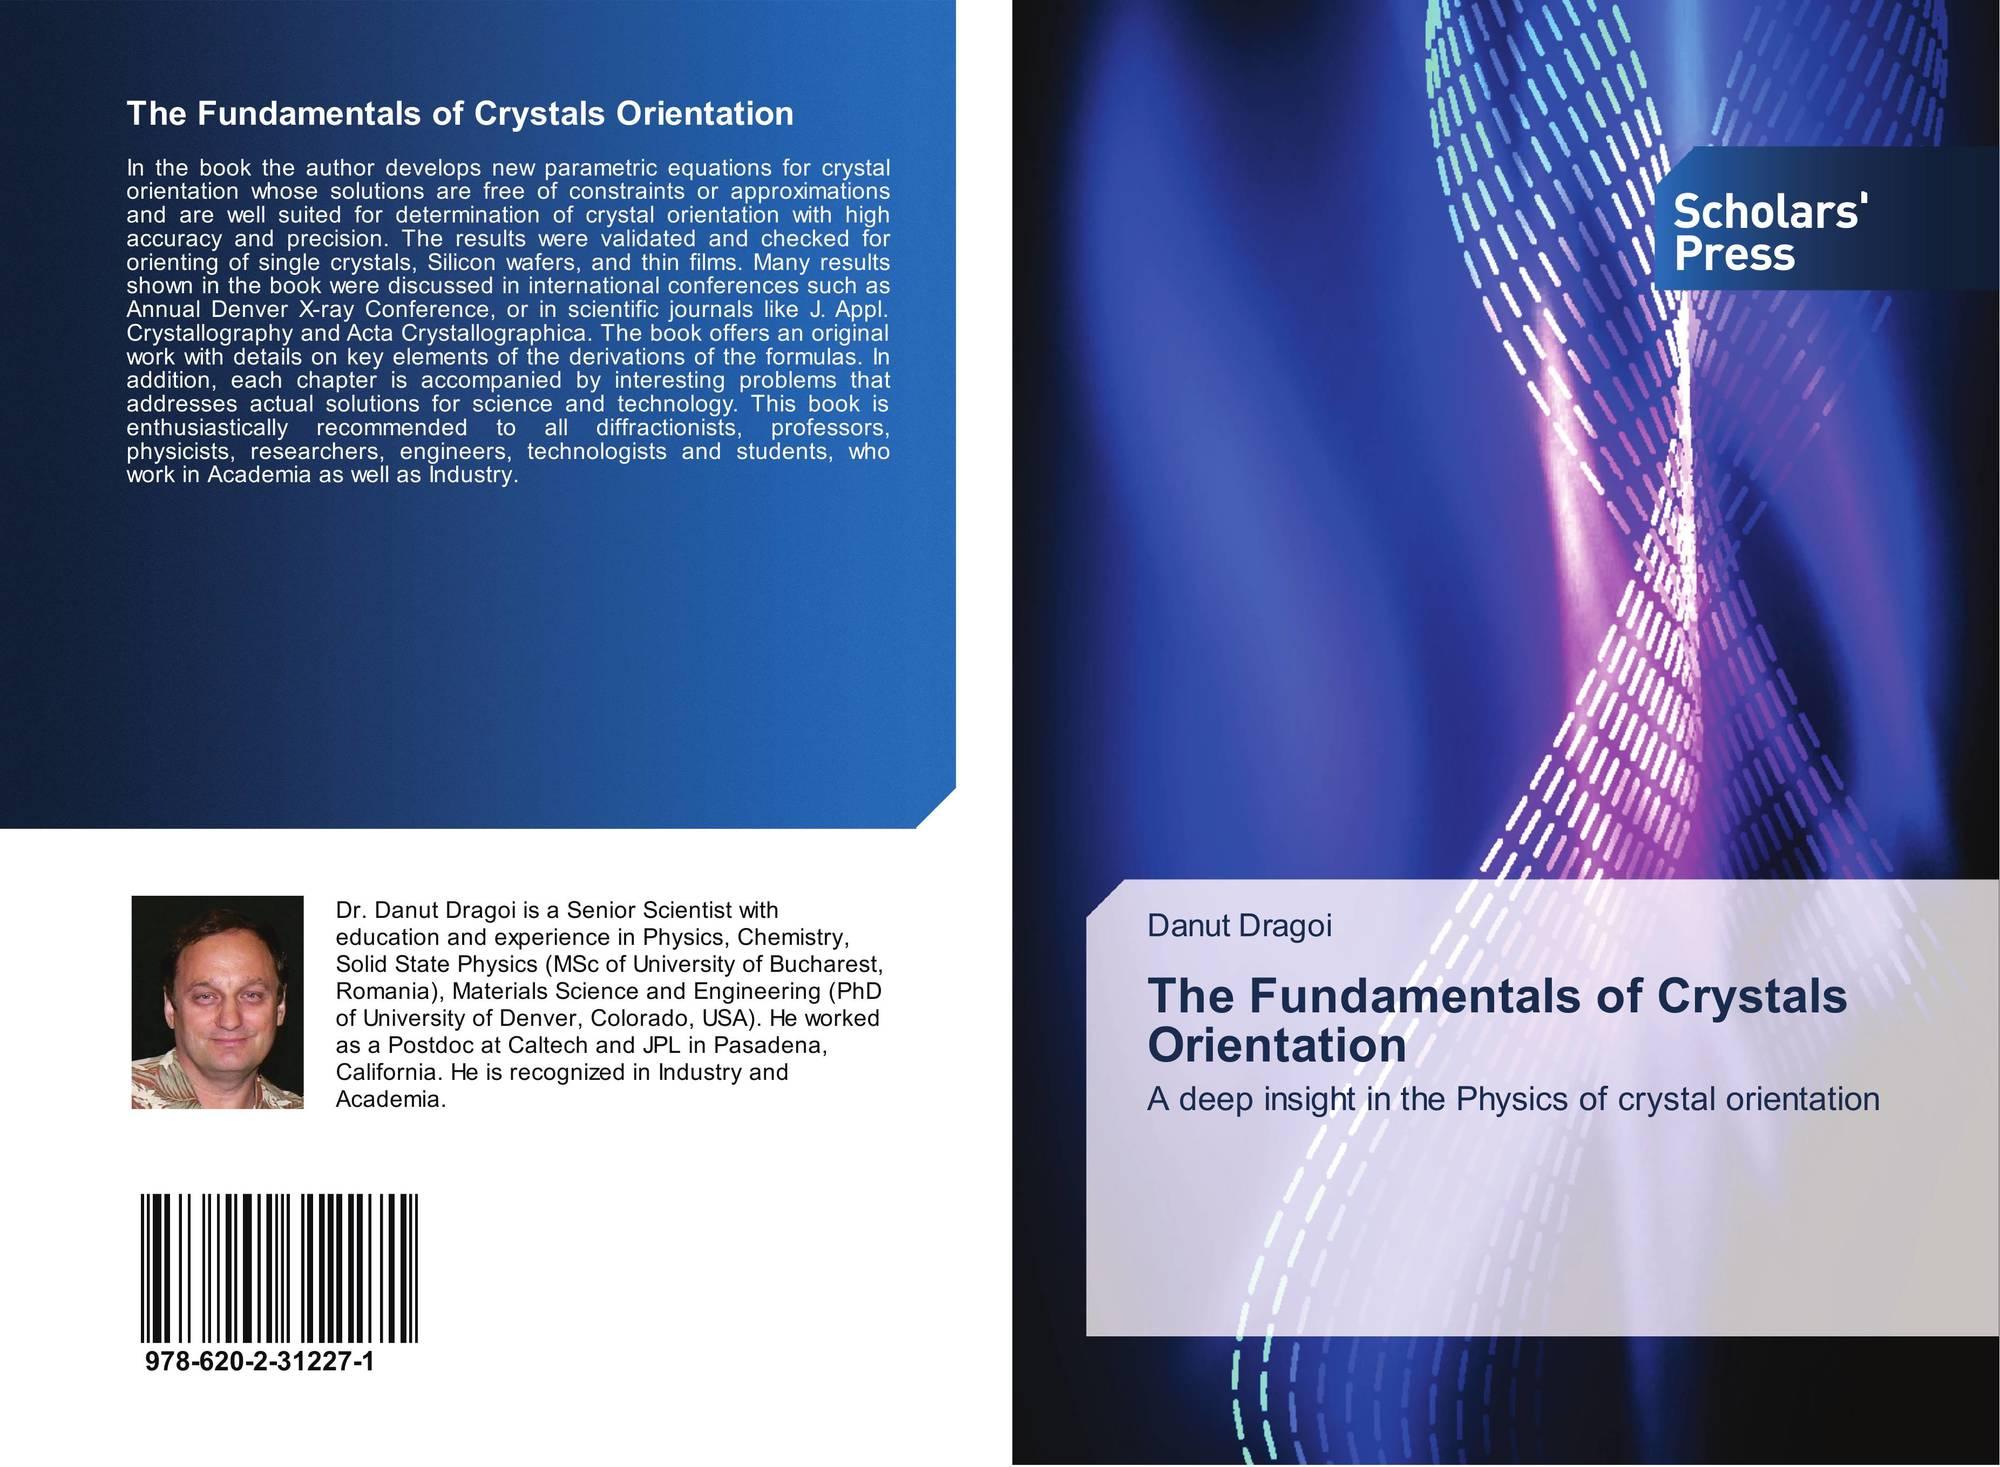 The Fundamentals of Crystals Orientation, 978-620-2-31227-1